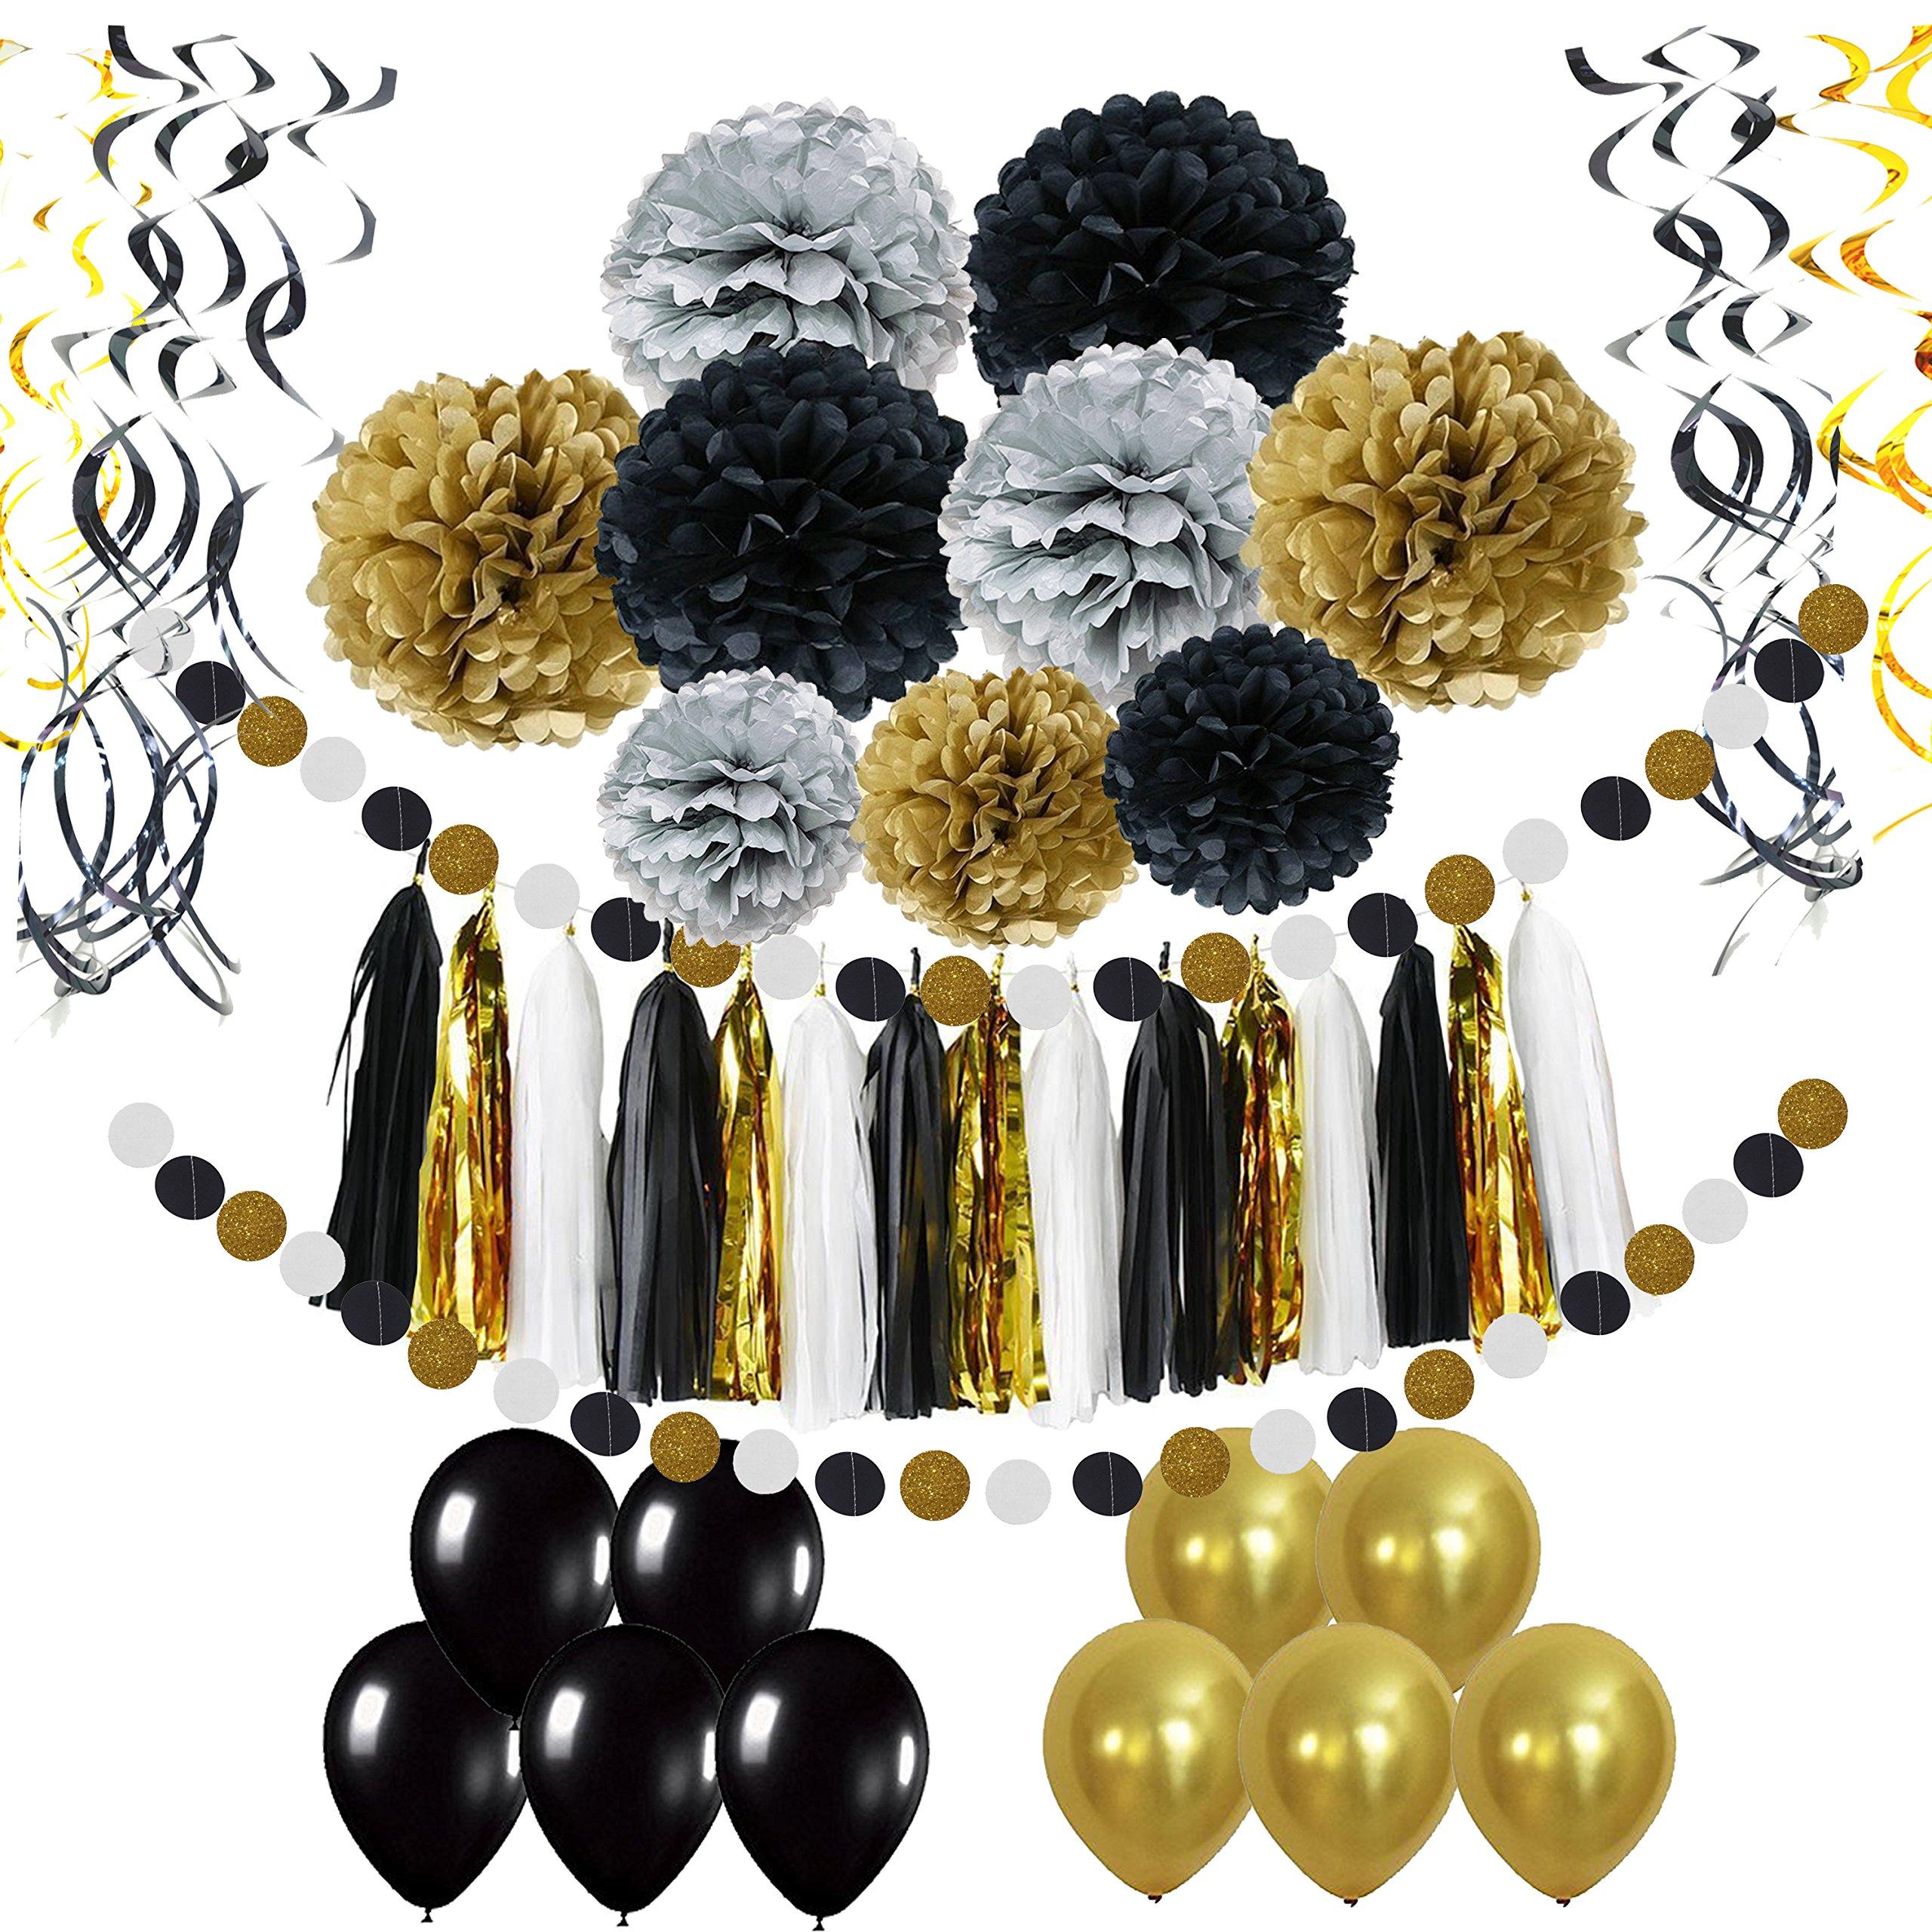 Pietypet Party Decorations, Paper Pom Poms Paper Tassel, Polka Dot Garland, Hanging Swirl Balloon Kit Baby Shower Wedding Birthday Celebration Table Wall Decoration - Black